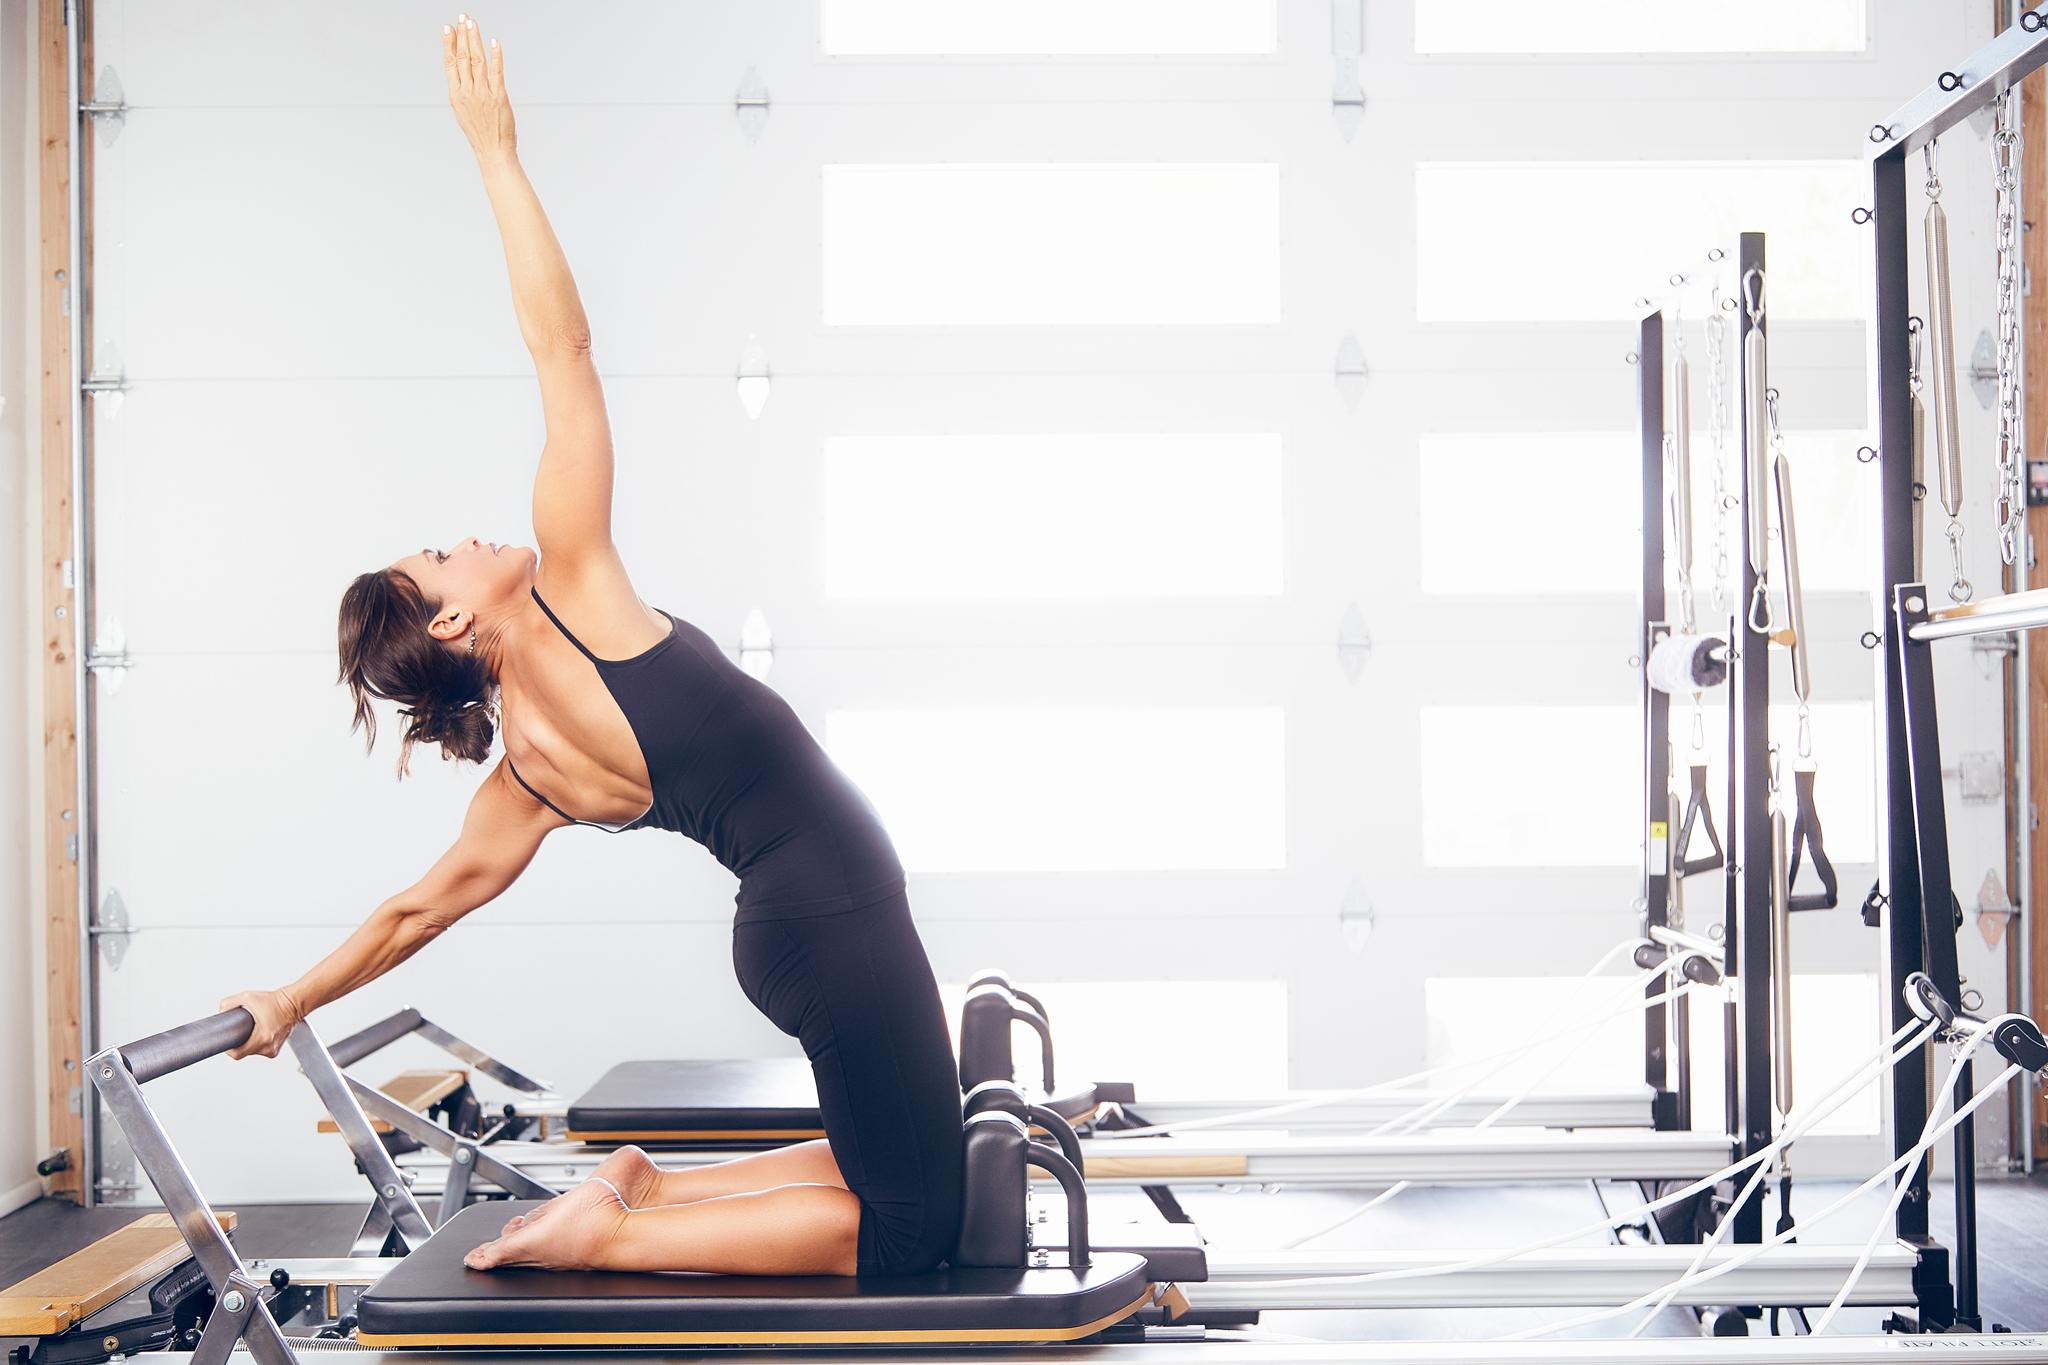 Phoenix Commercial Fitness Photographer - Pilates Photography